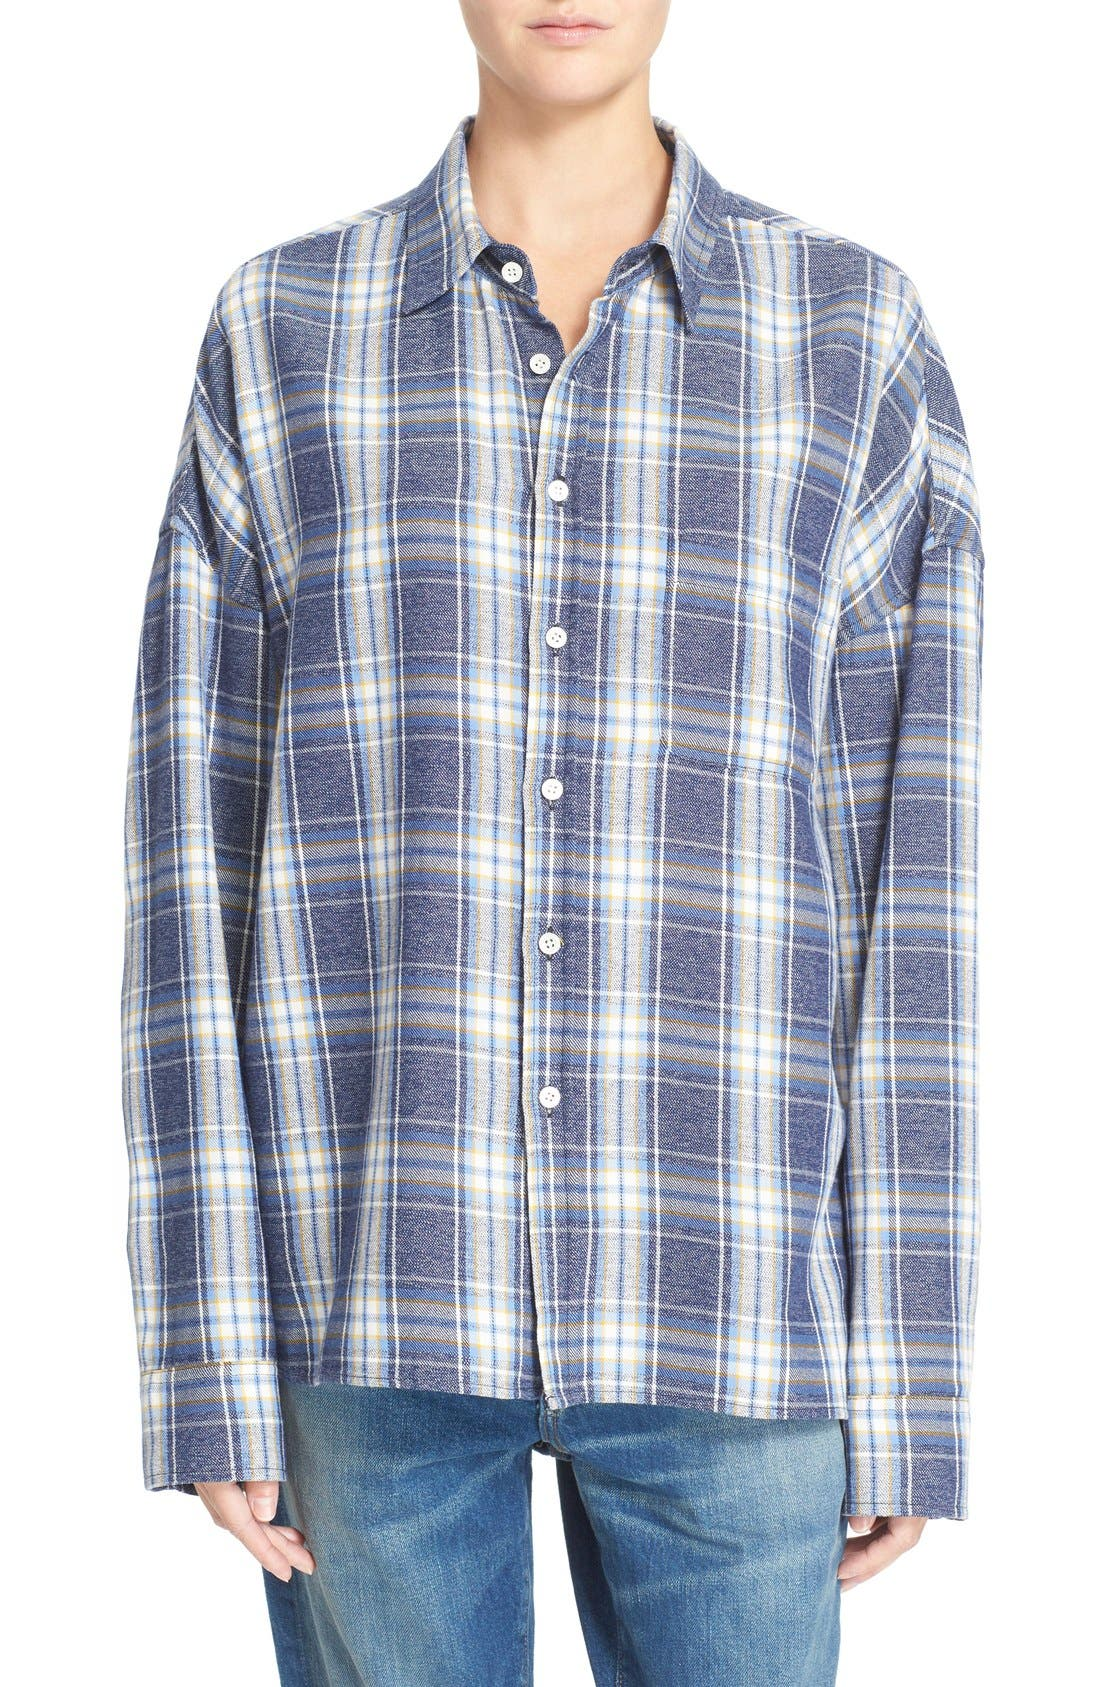 Alternate Image 1 Selected - 6397 'Lori' Cotton Flannel Shirt